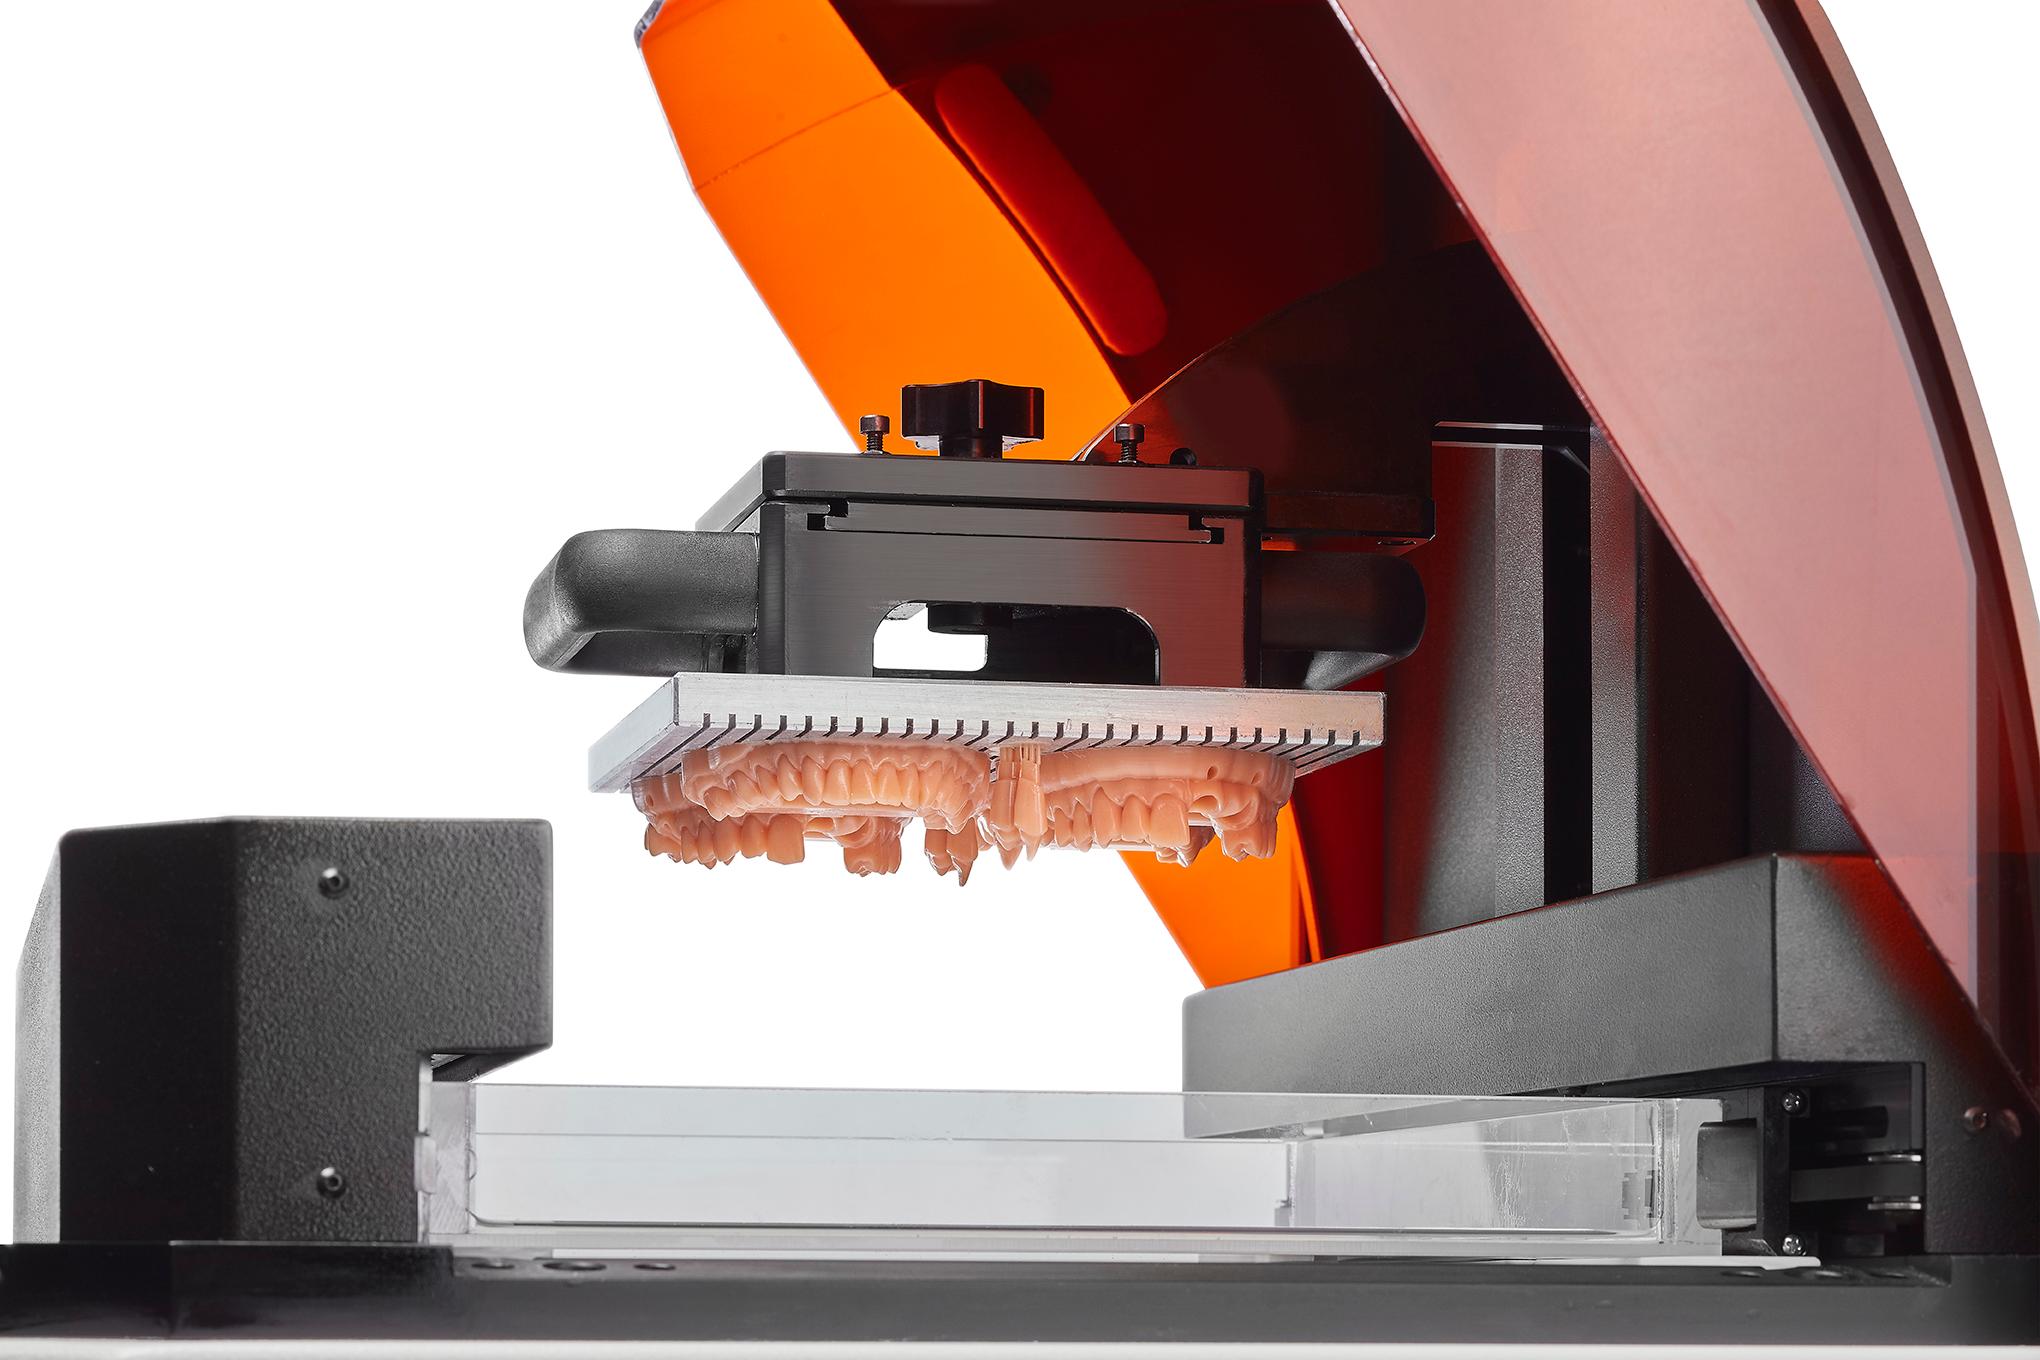 stampante 3d adatta per prototipi dentali e odontoiatrici